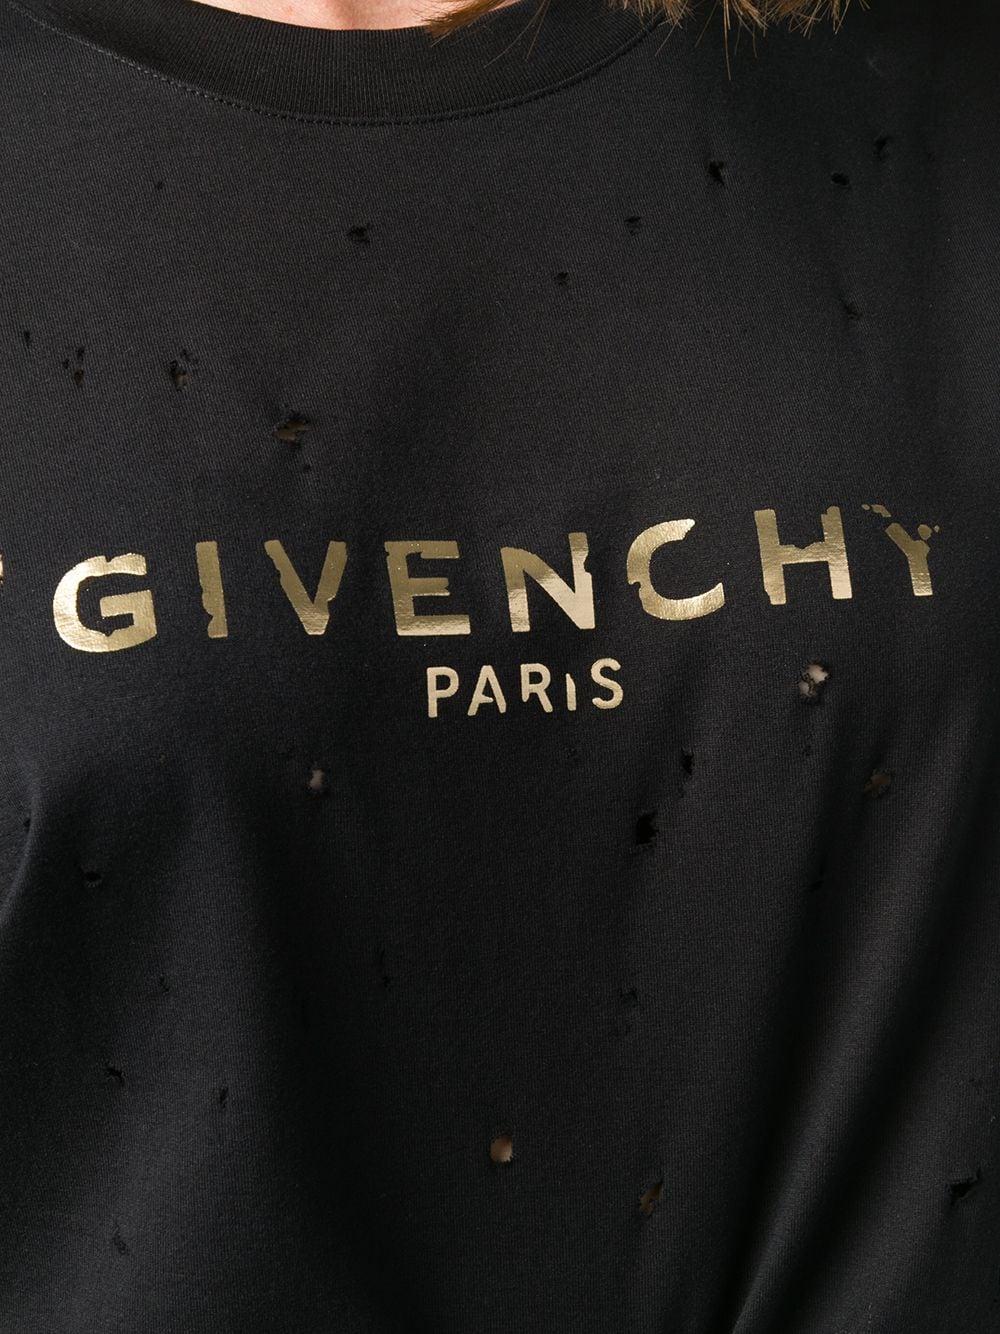 Givenchy Vintage Logo Print T Shirt Farfetch Vintage Logo Print T Shirt Givenchy